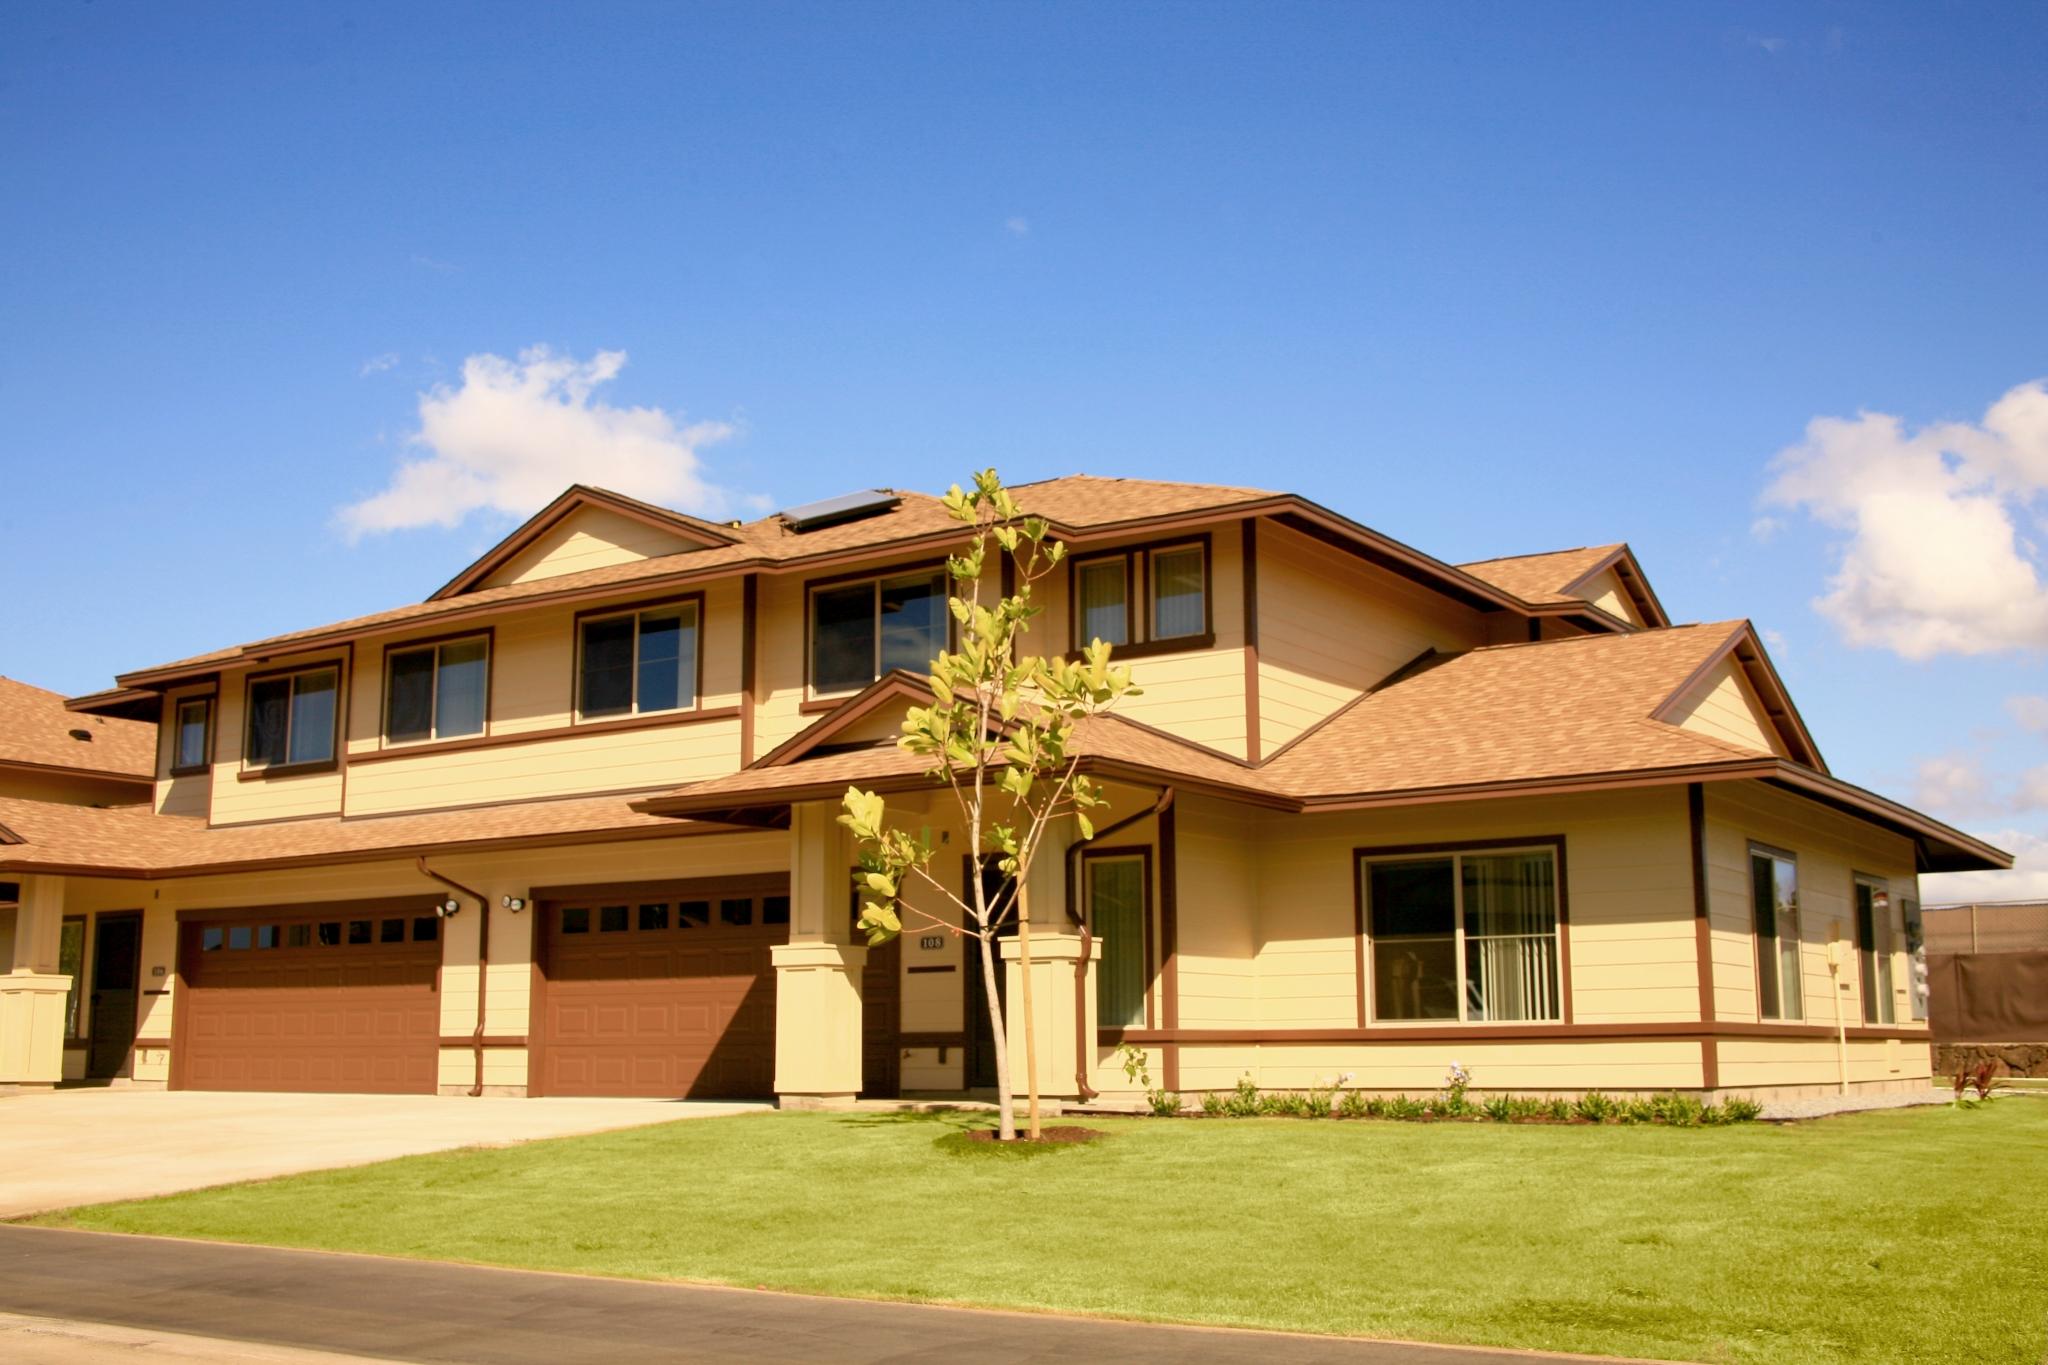 hickam afb base housing floor plans hickam base housing floor plans free home design ideas